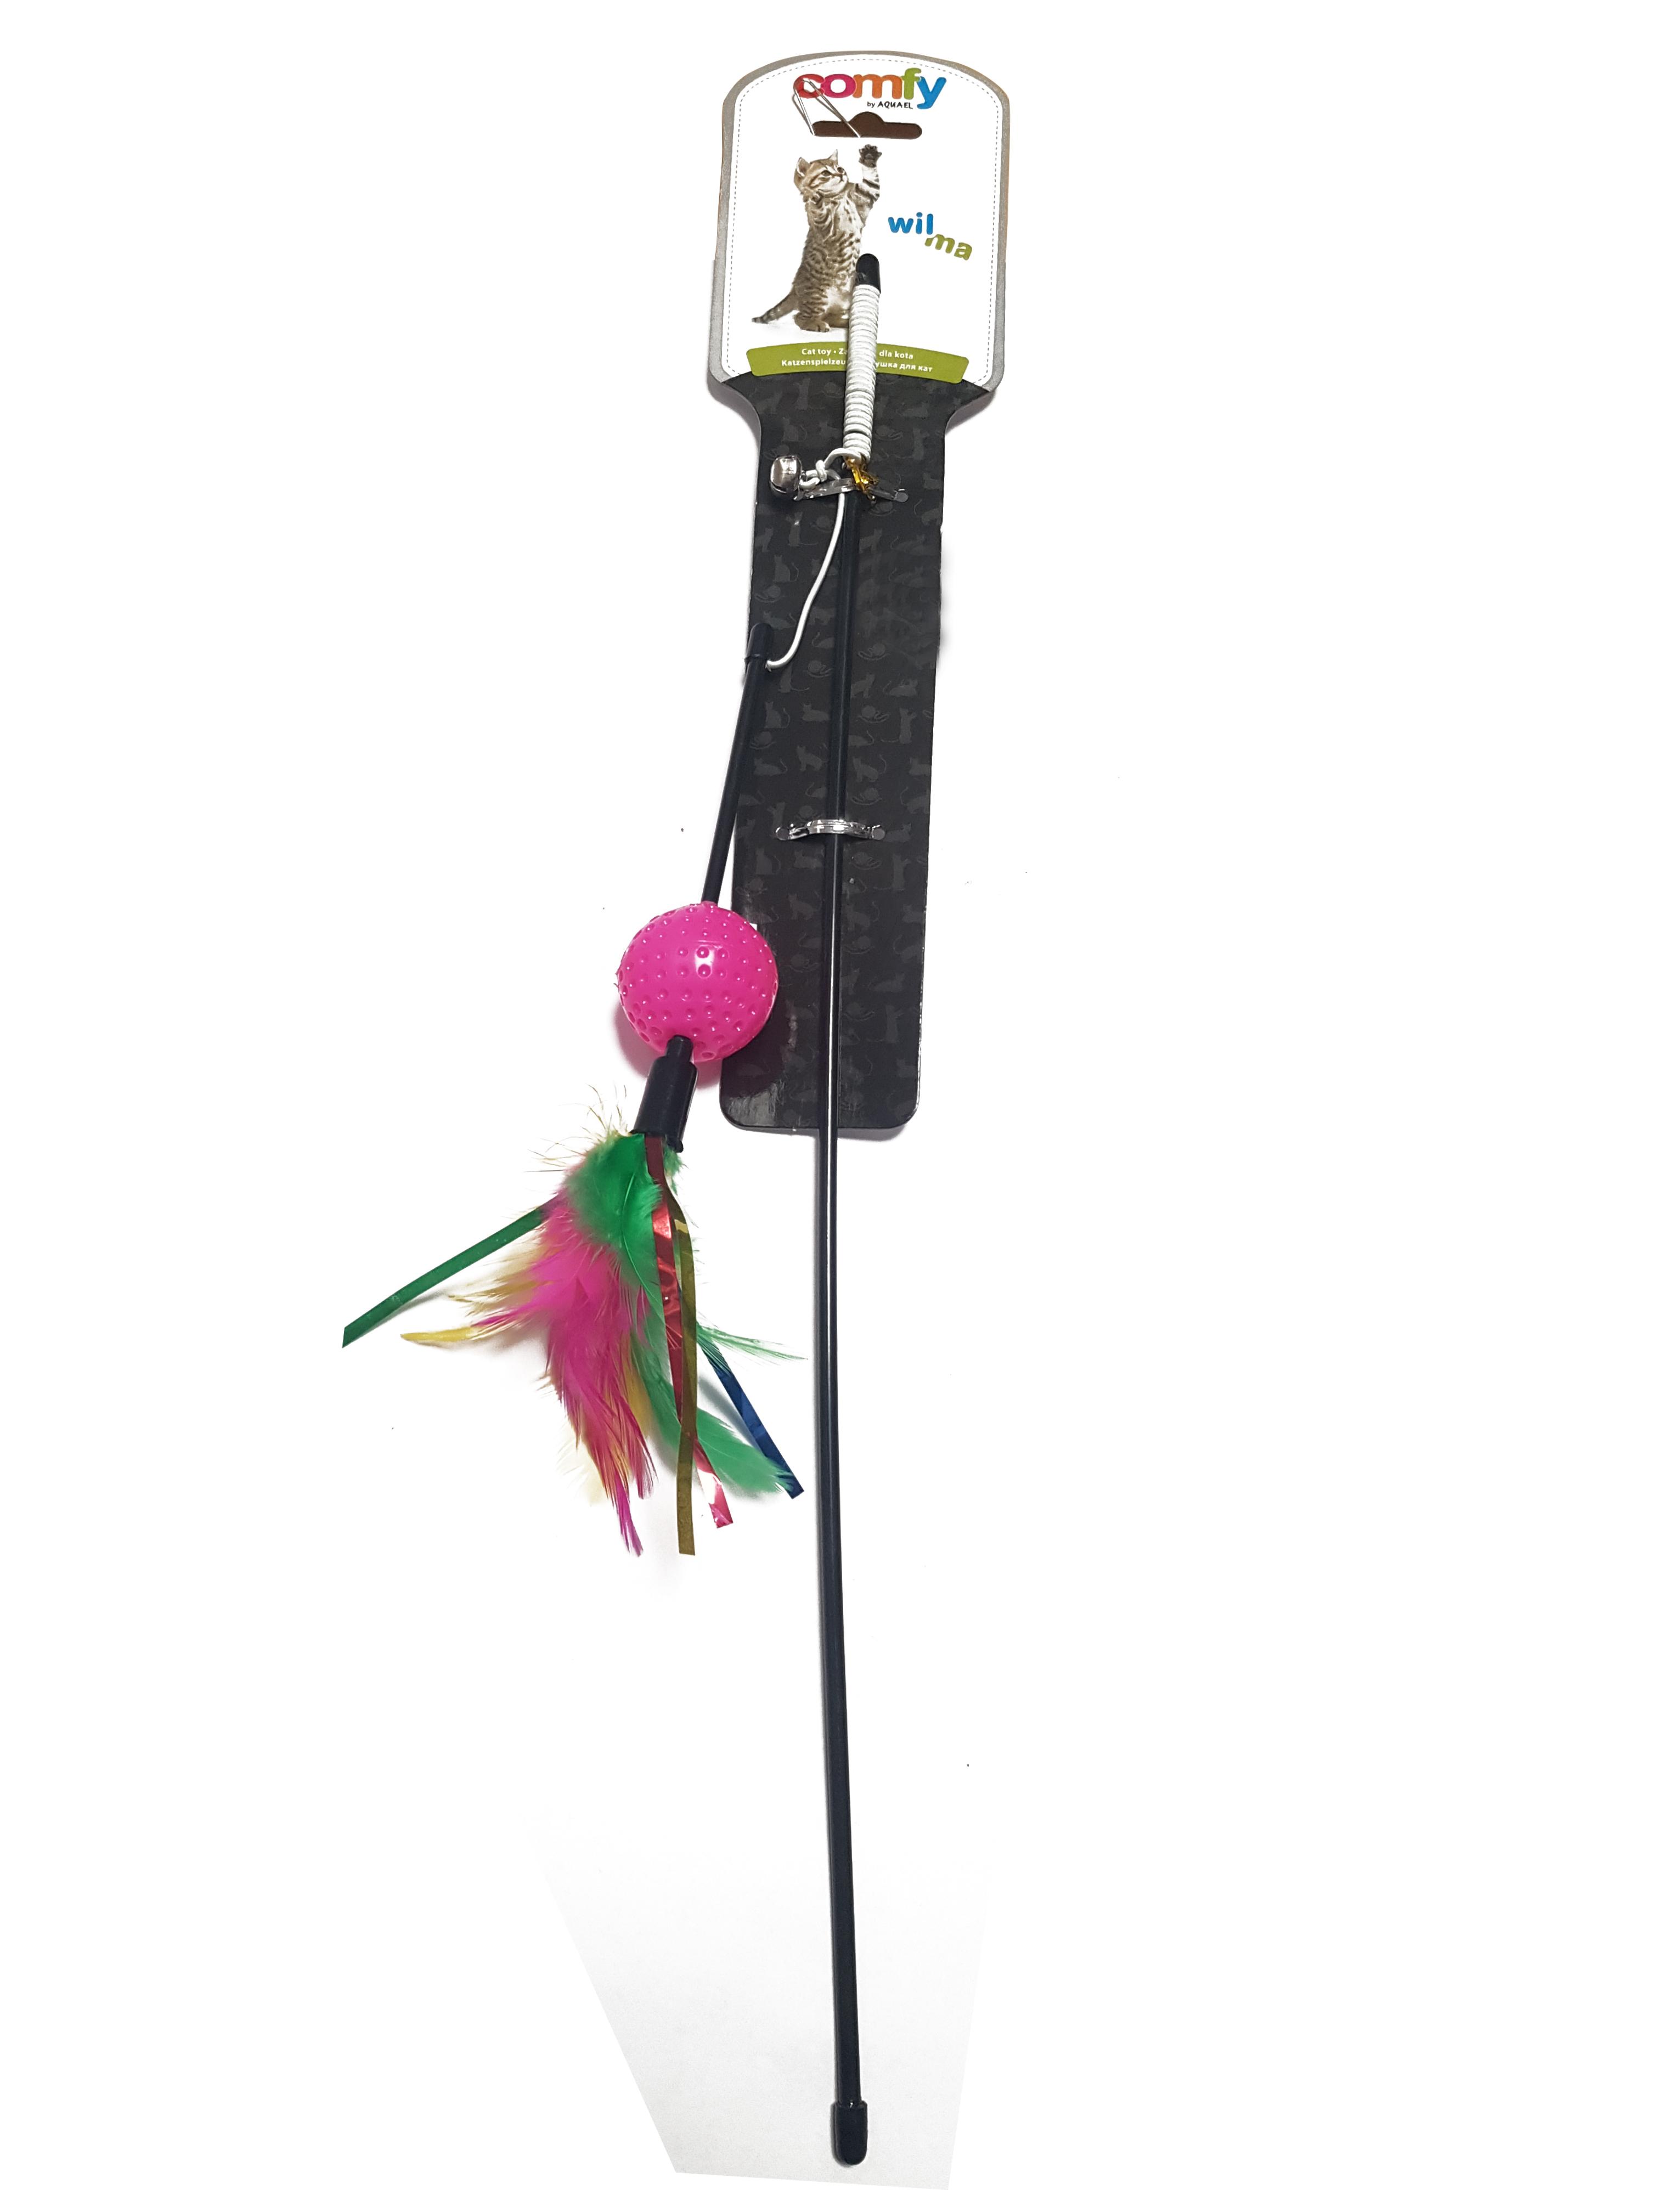 Jucarie pentru pisici Comfy Wilma Rod Ball, roz, Aquael, 65cm 0